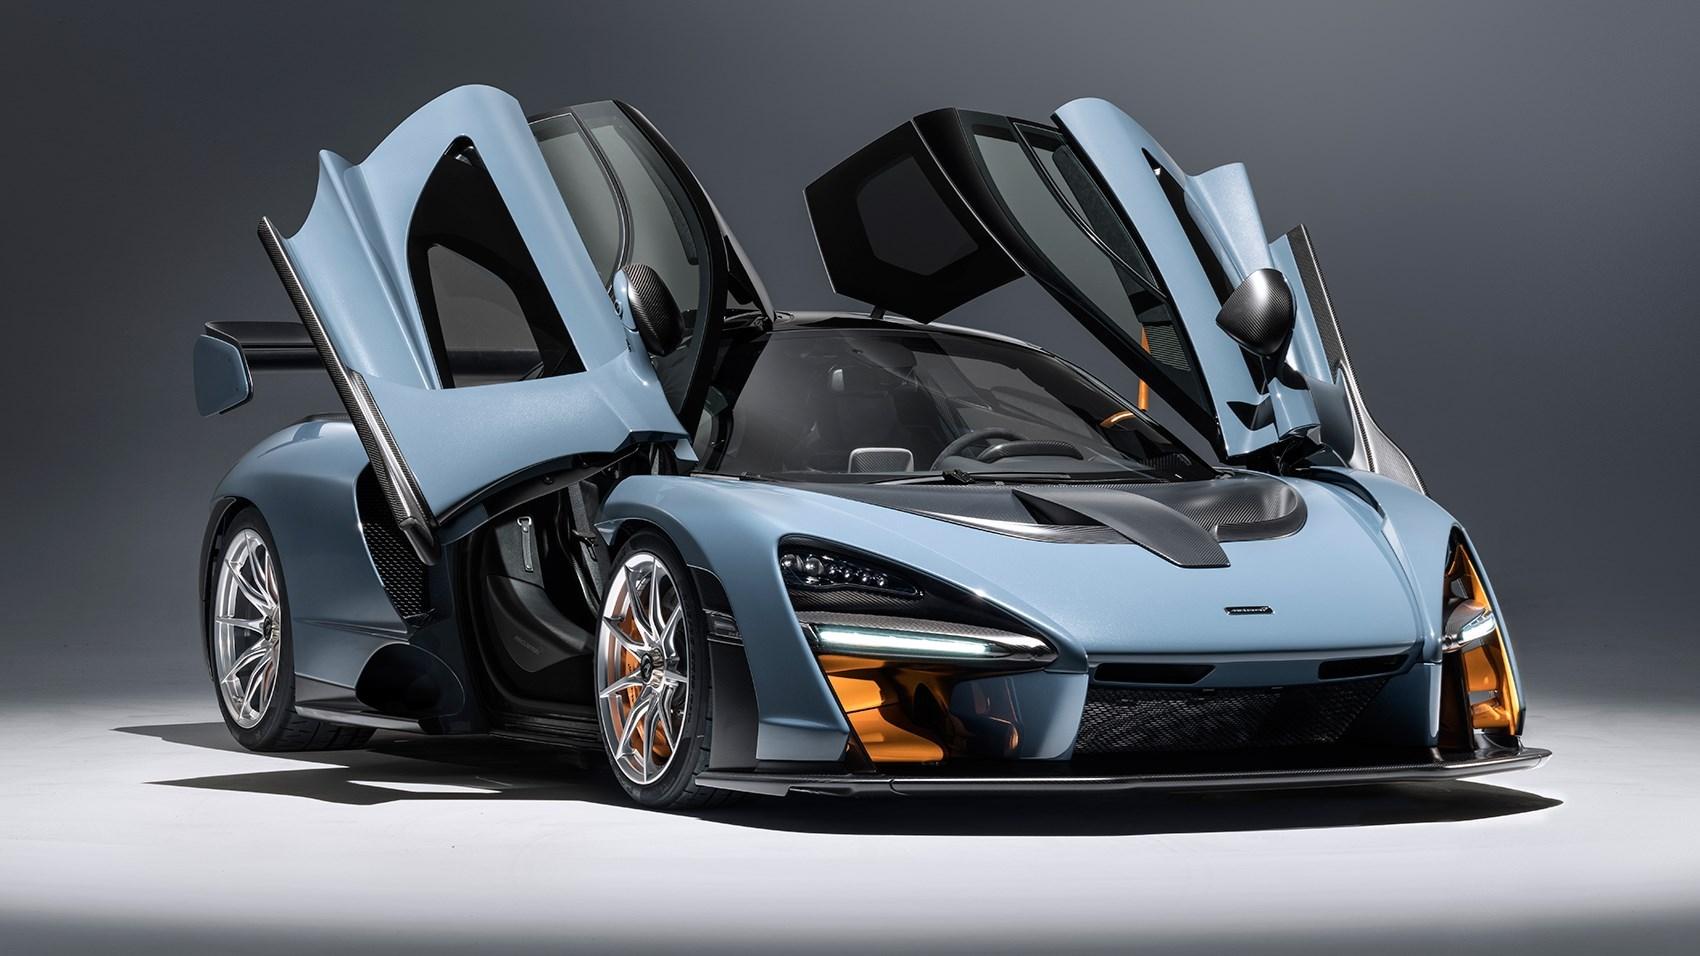 2019 Cars: Hypercars Of 2019